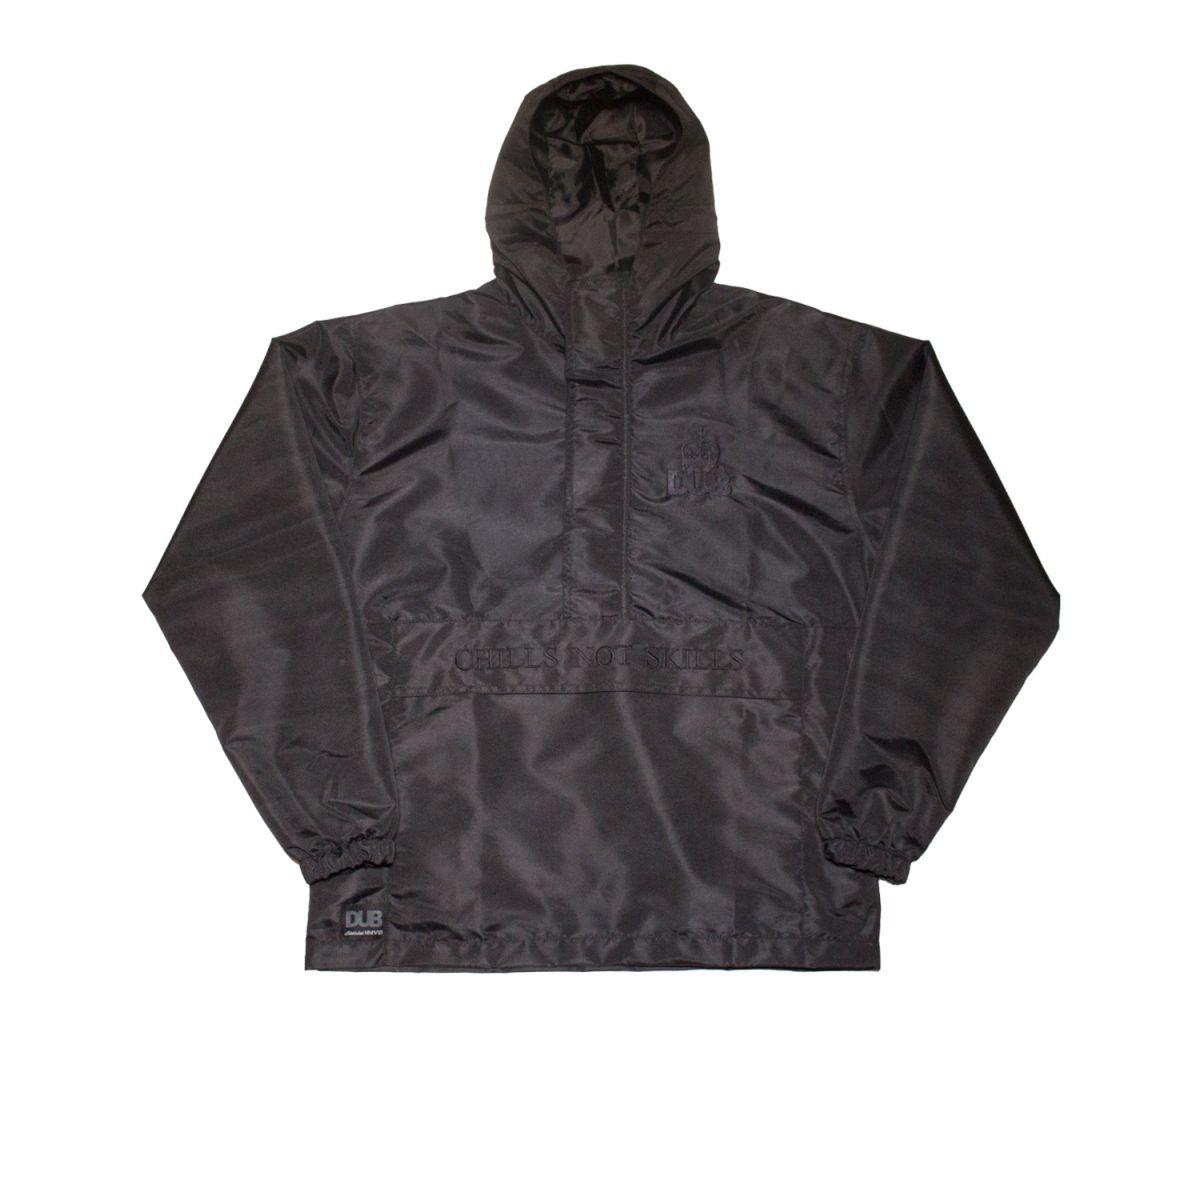 Kurtka DUB Highlife Pullover Jacket Black